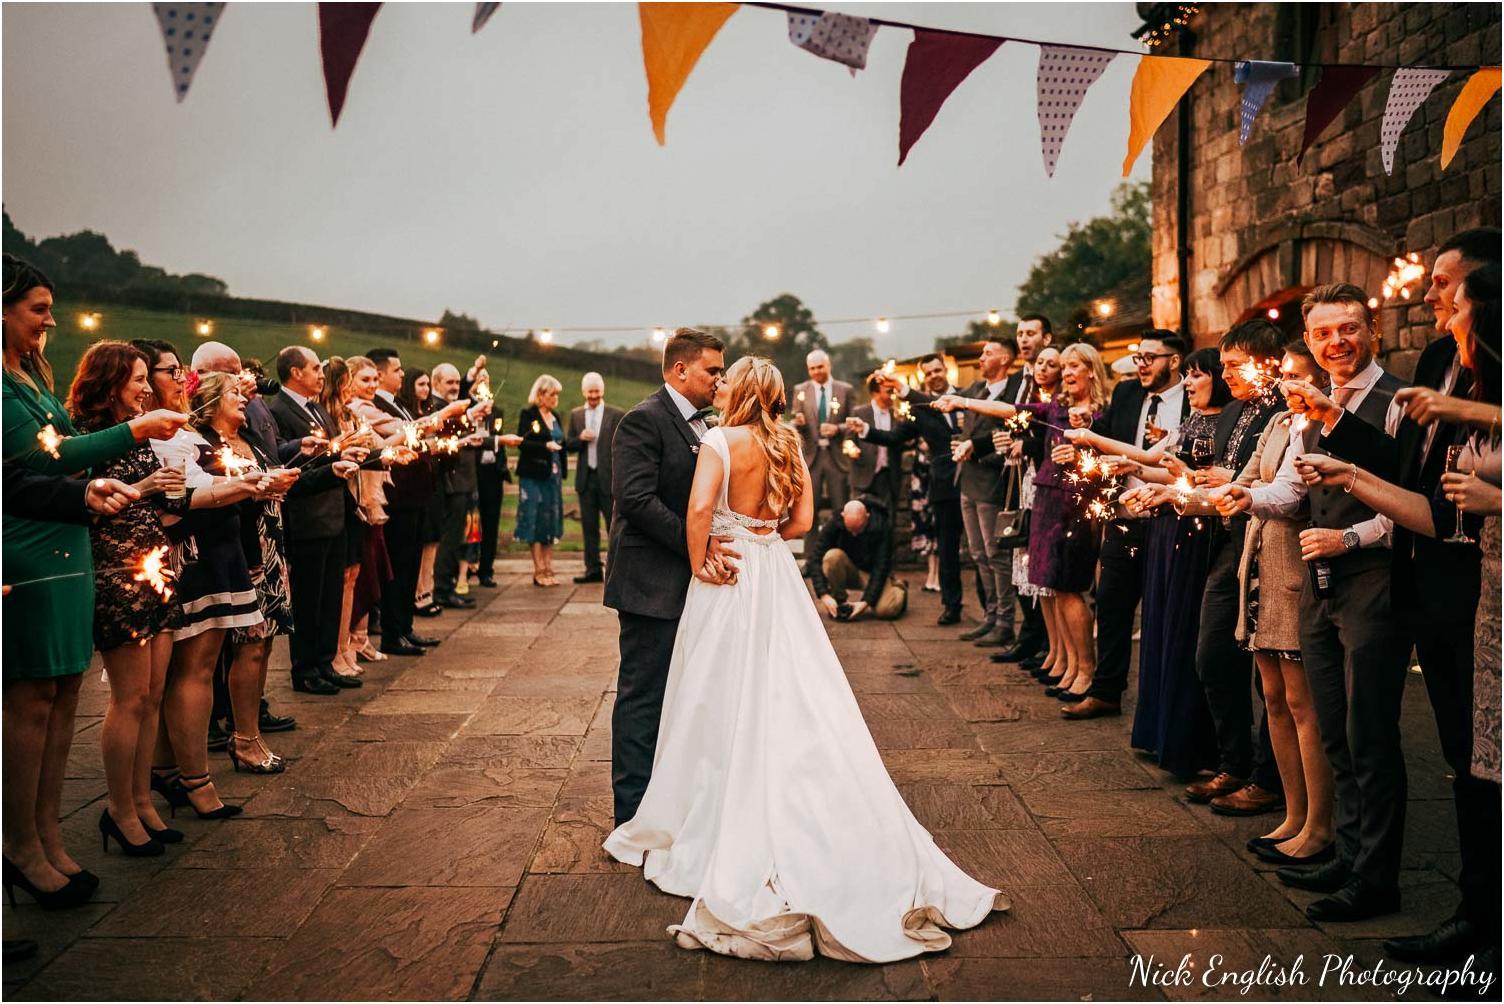 The_Ashes_Barn_Endon_Stoke_Wedding_Photographer-141.jpg